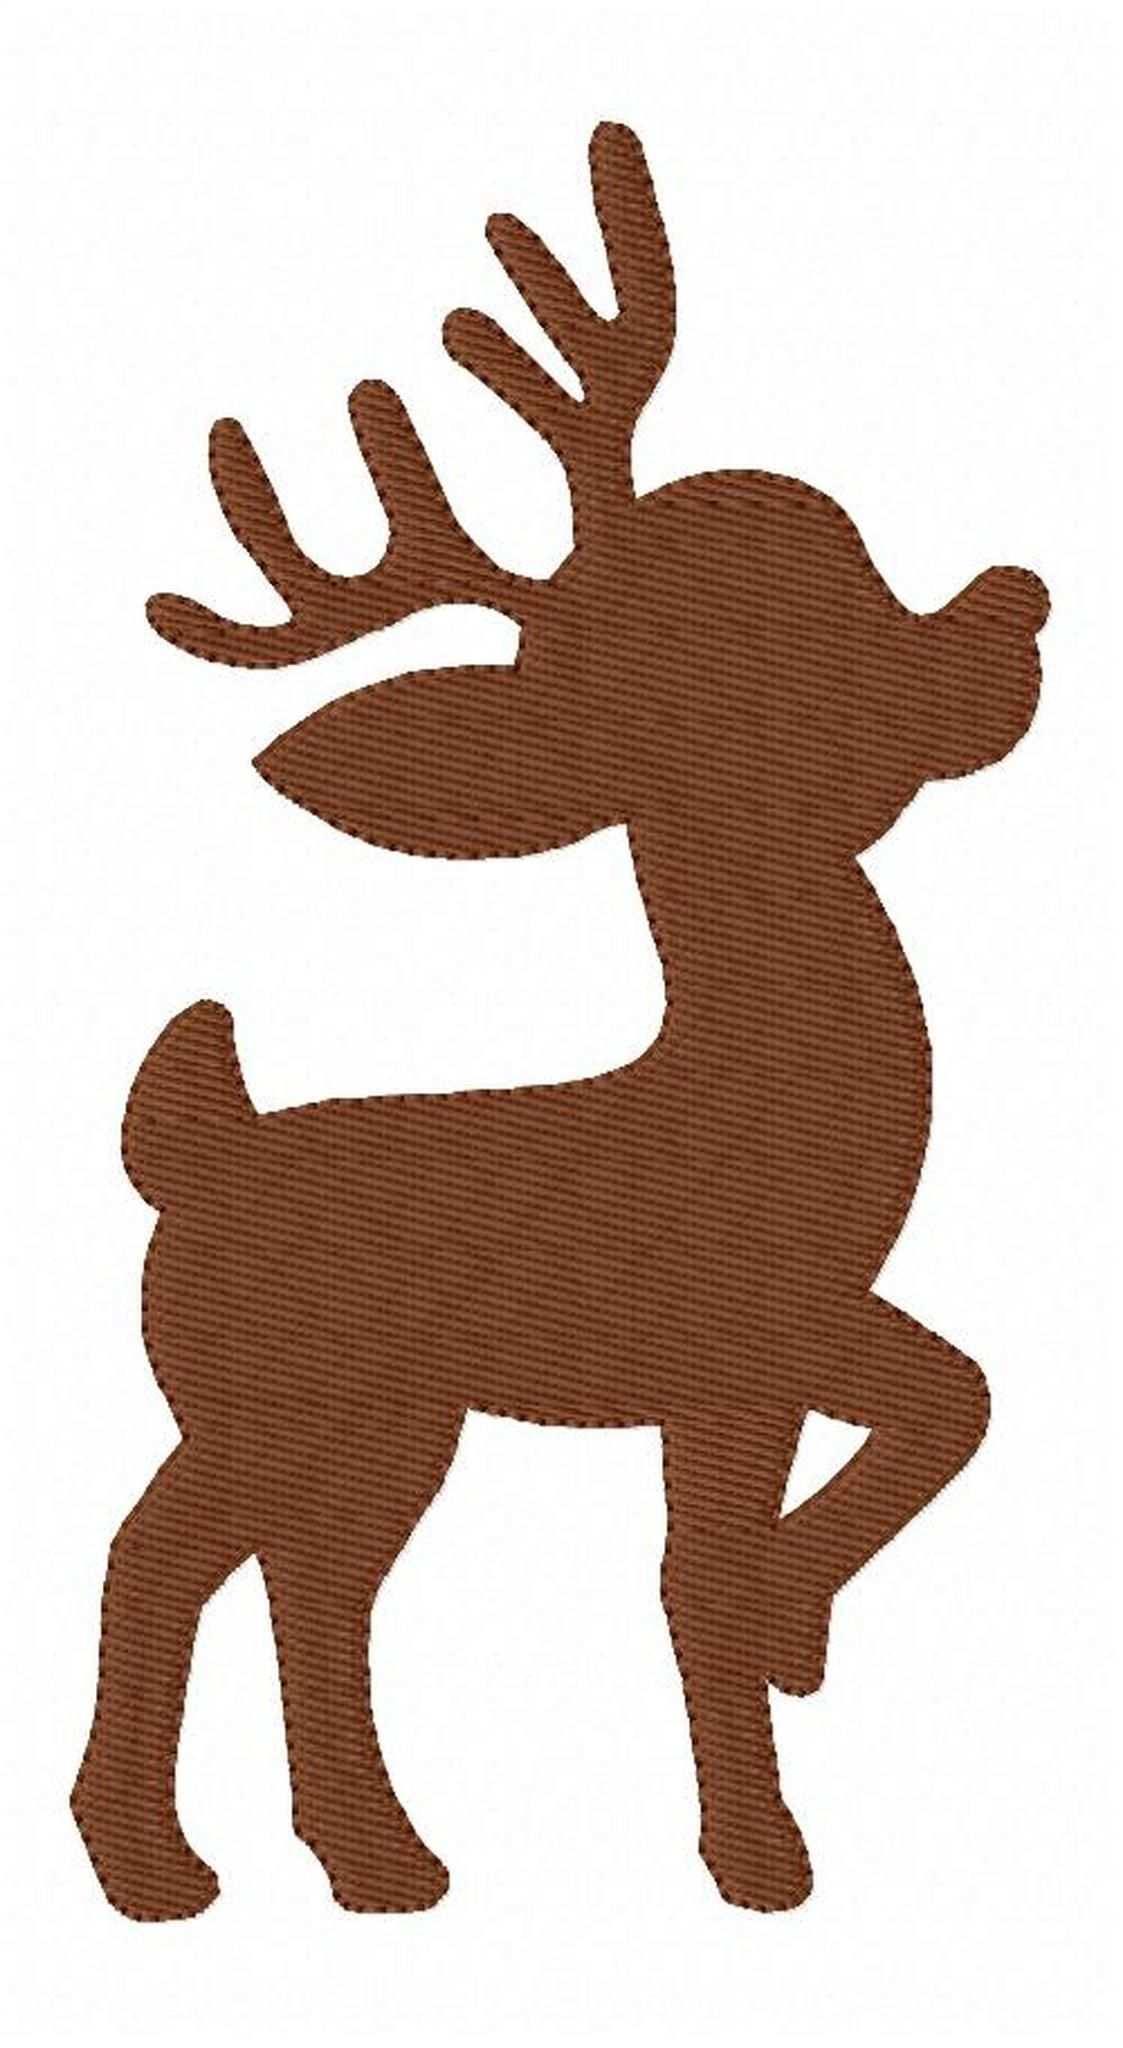 Best 12 Reindeer 1757 Joyful Stitches Skillofking Com Weihnachten Basteln Tonkarton Bastelarbeiten Weihnachten Holz Basteln Weihnachten